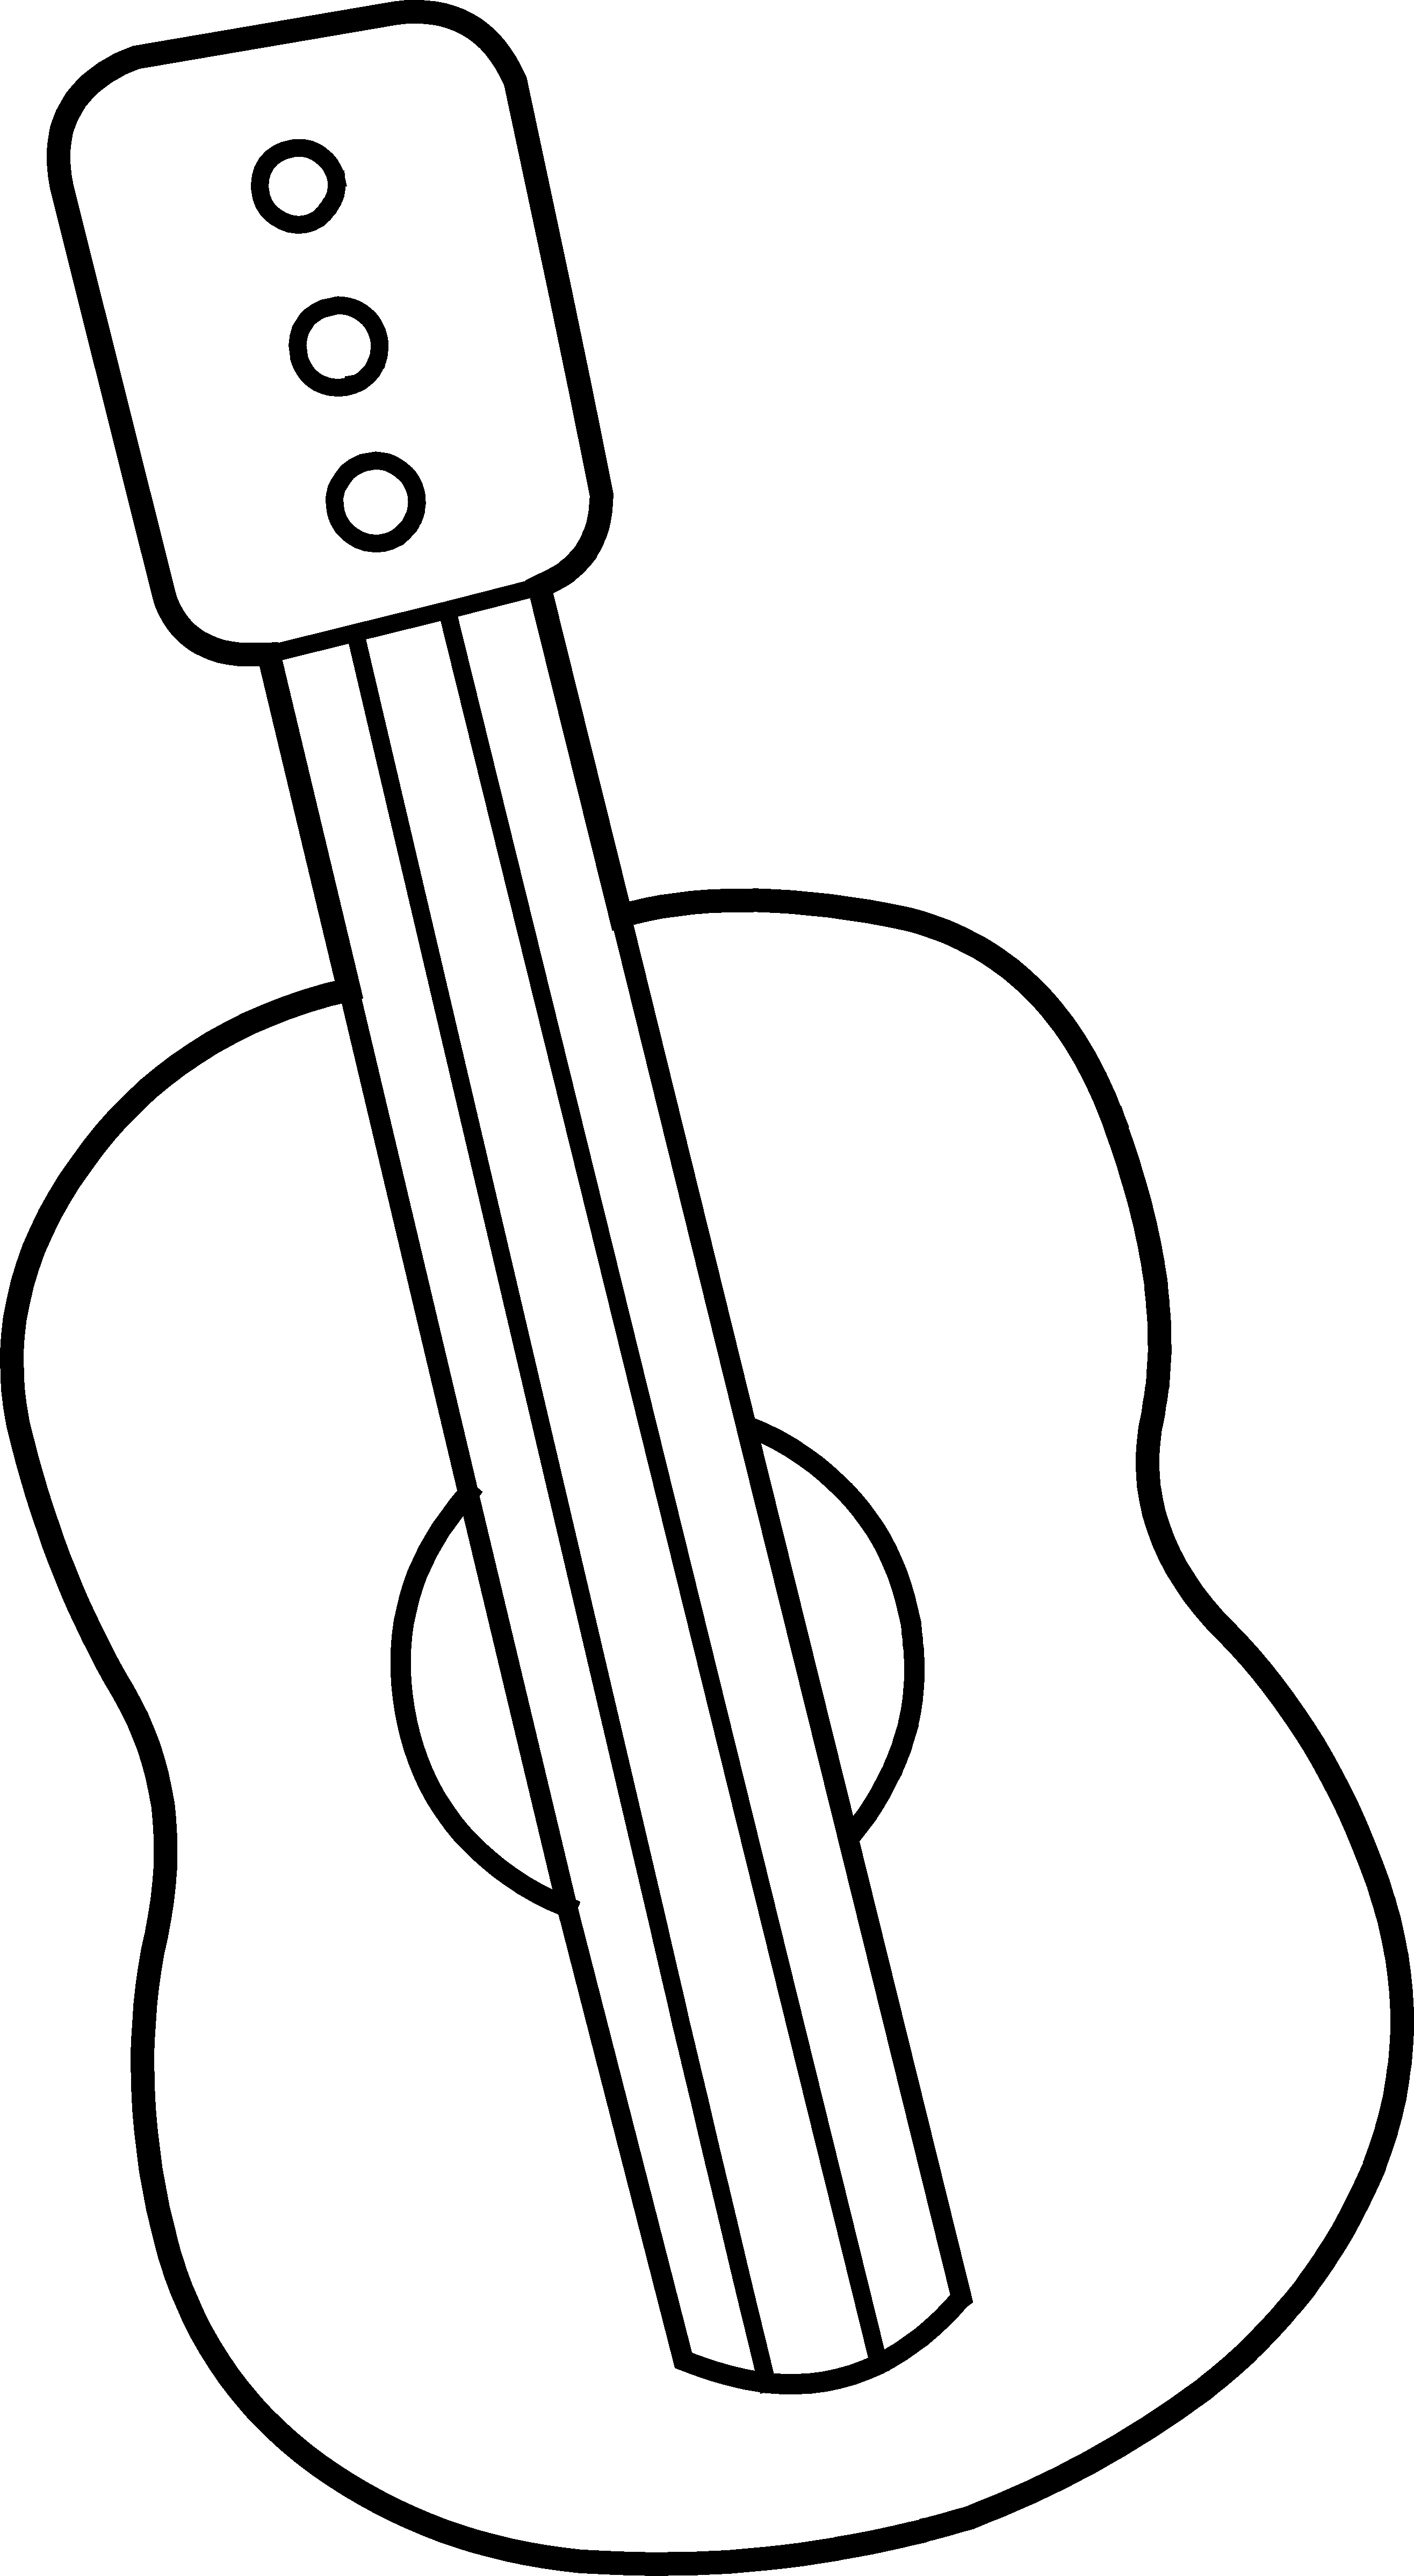 Guitar Outline Clipart Clipart Suggest